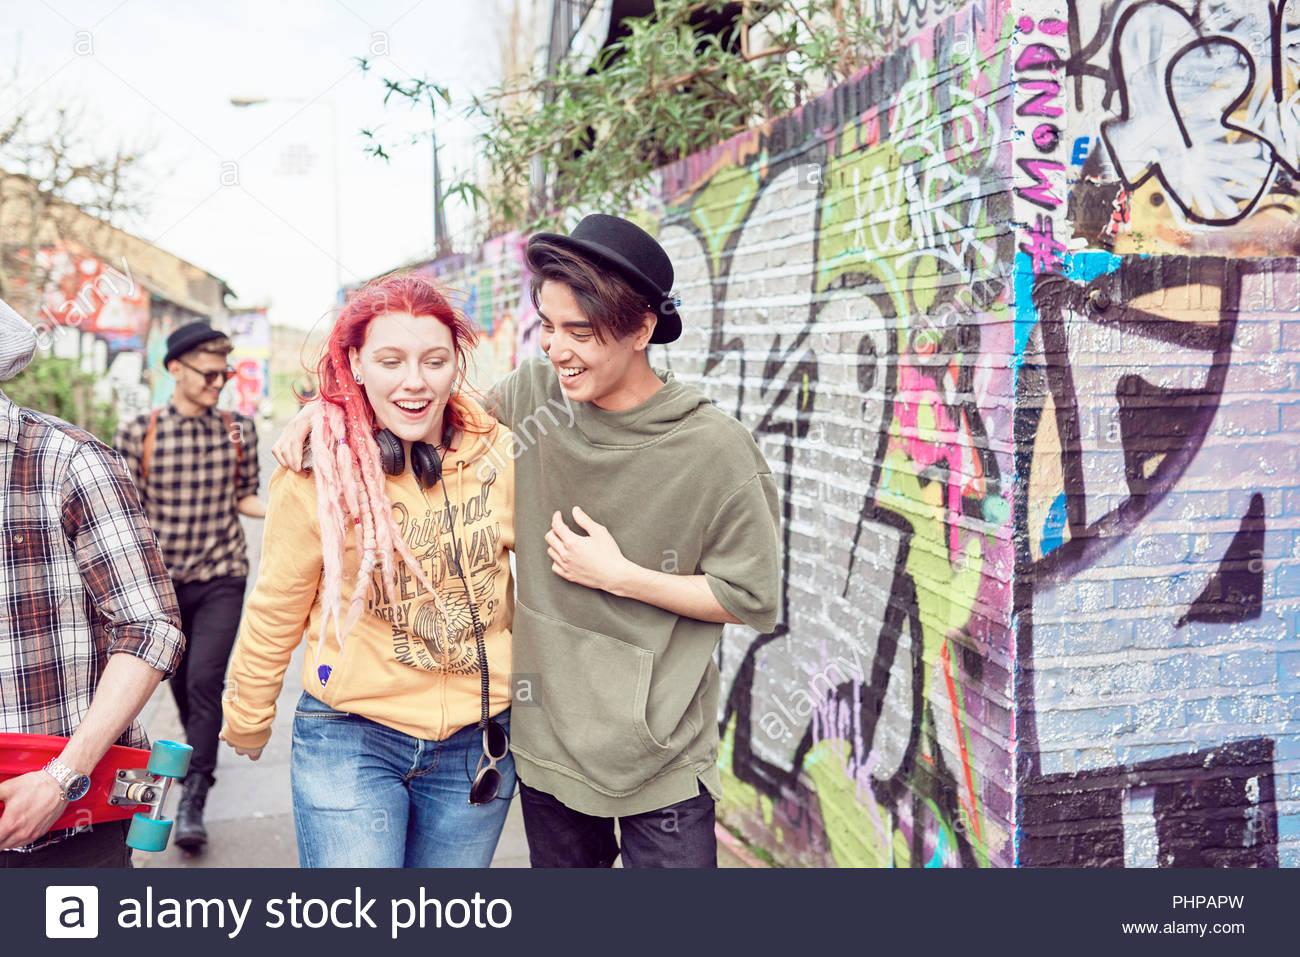 Teenage couple walking along street together - Stock Image